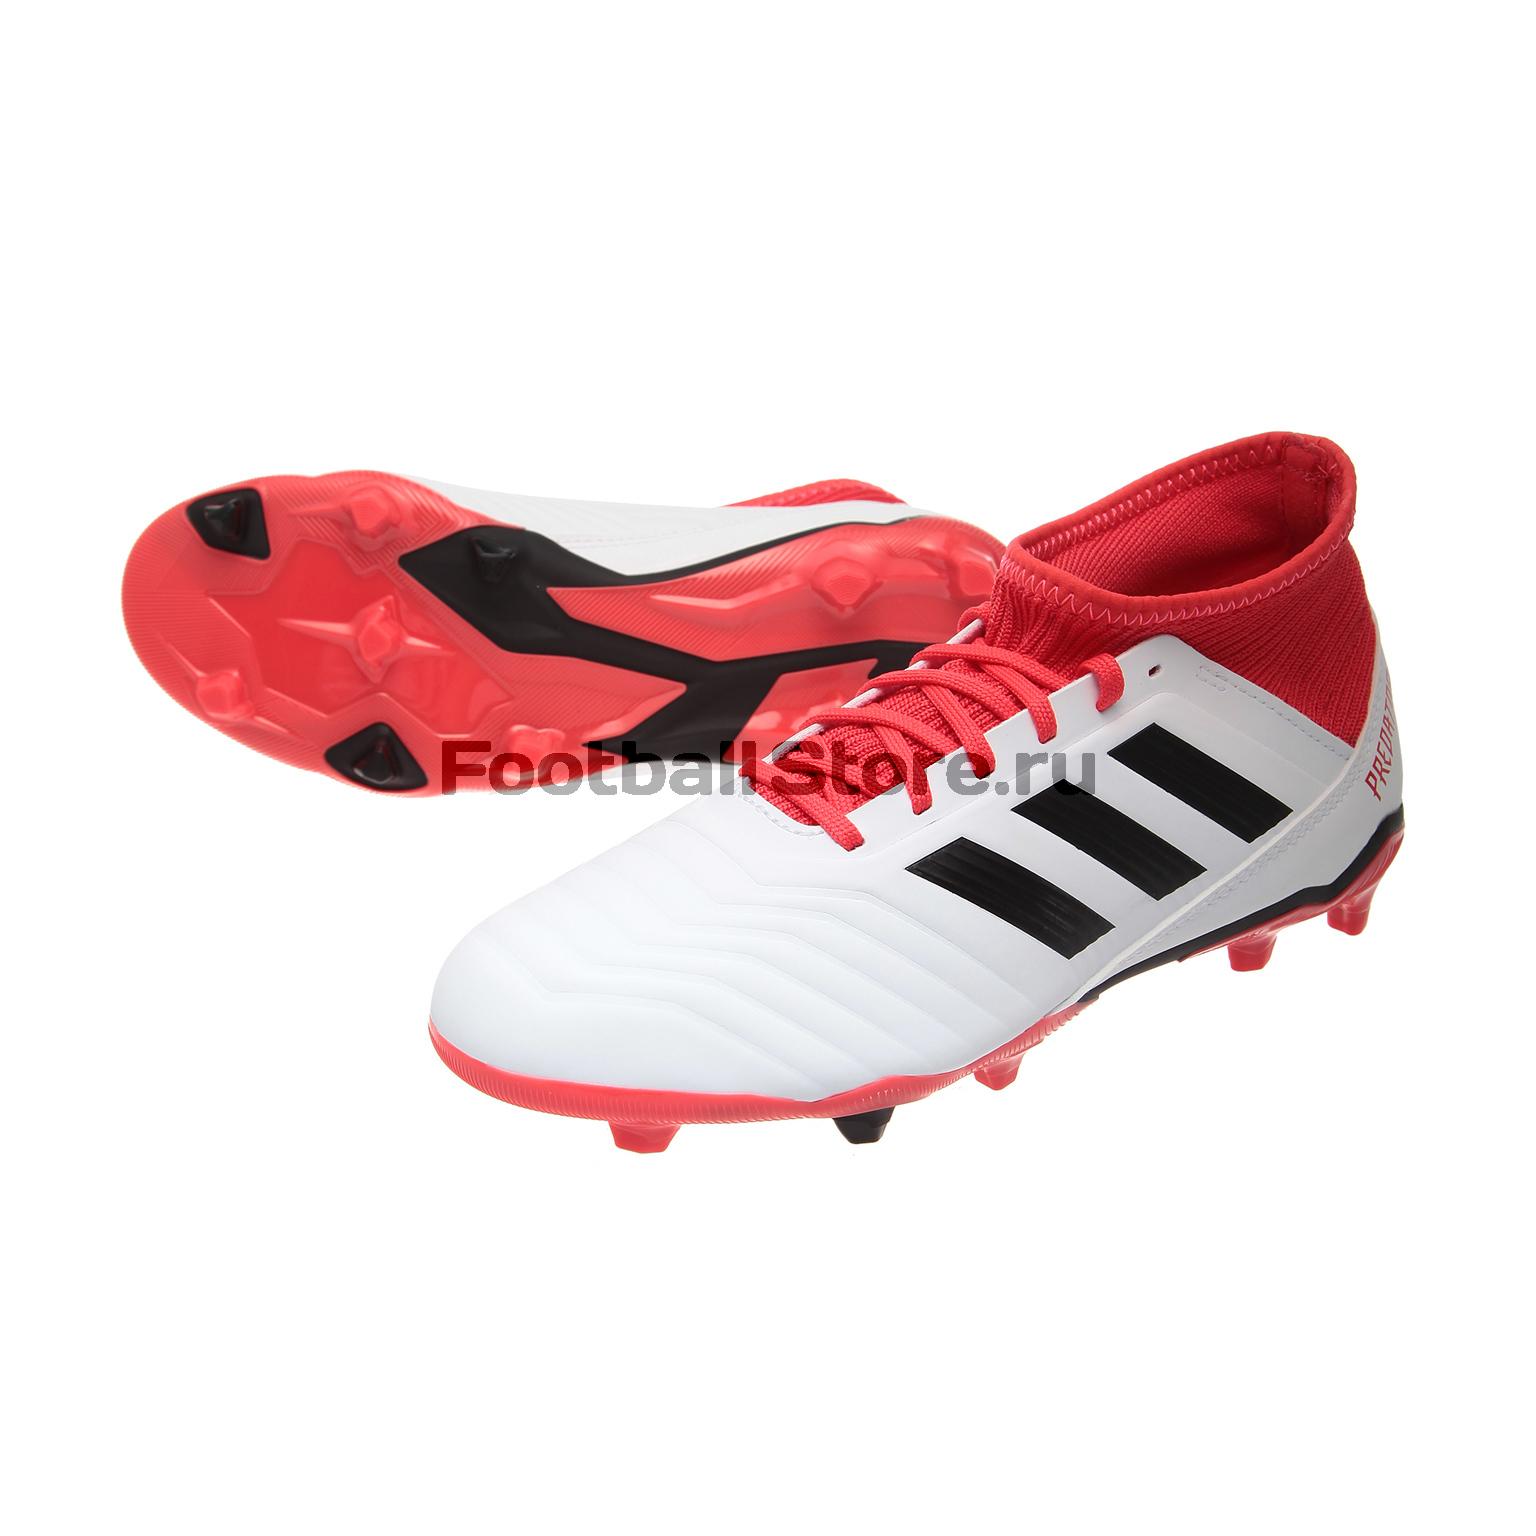 Бутсы Adidas Predator 18.3 FG JR CP9011 adidas predator junior gk glove